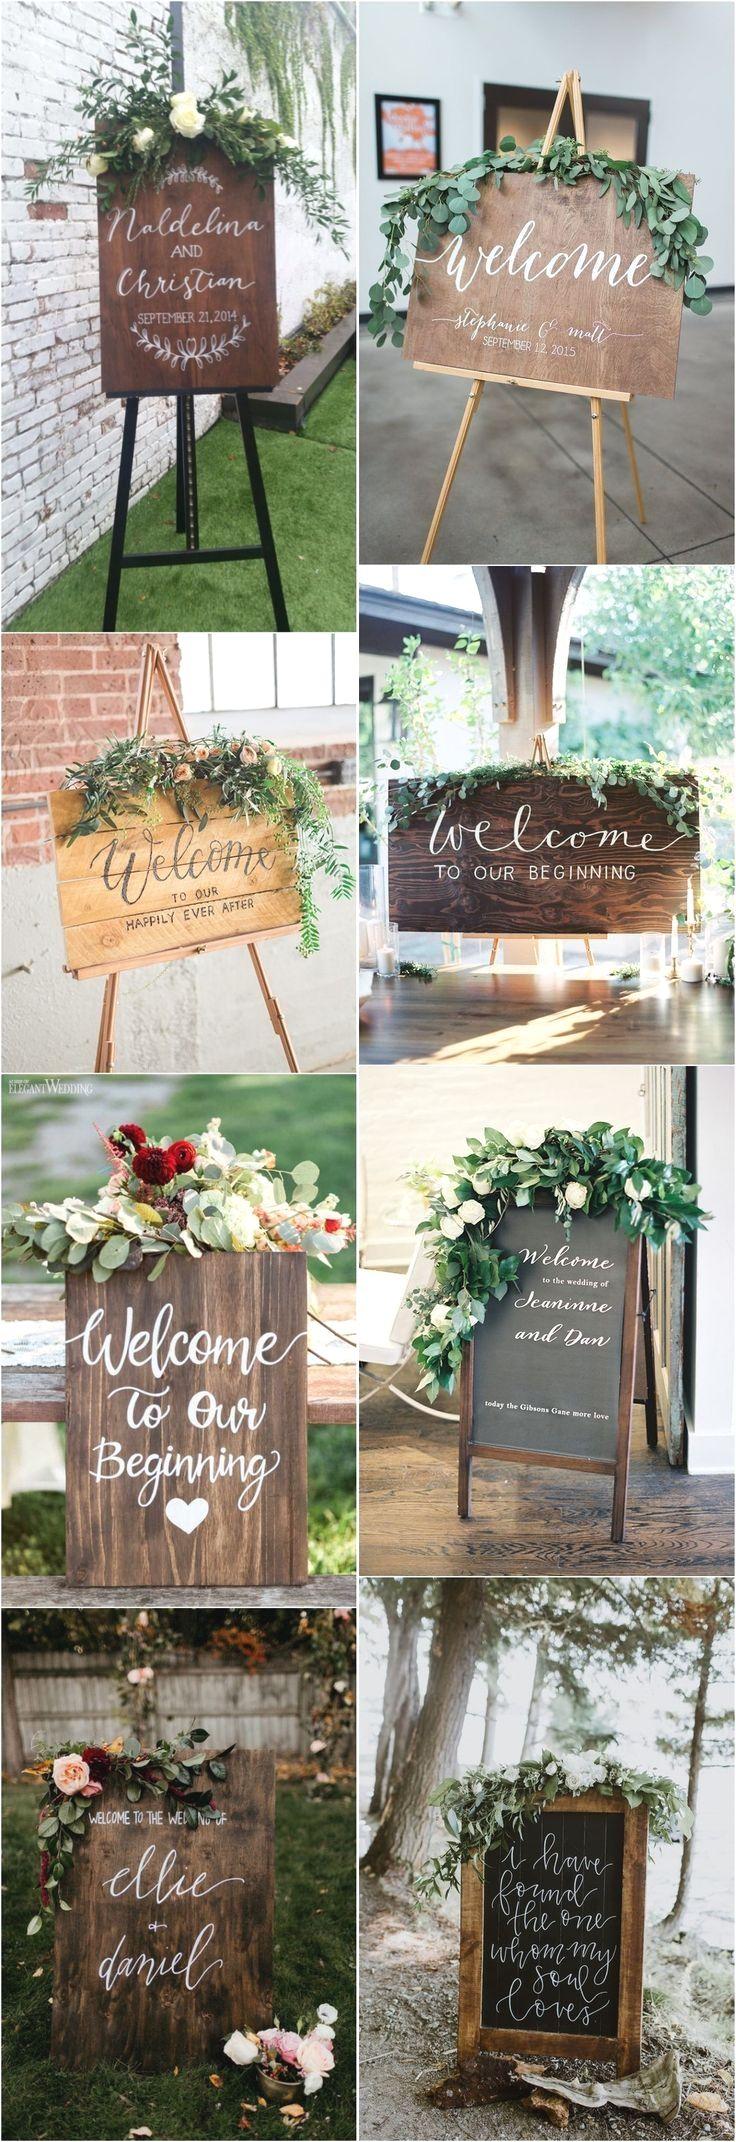 Amazing Rustic Wedding Sign Ideas